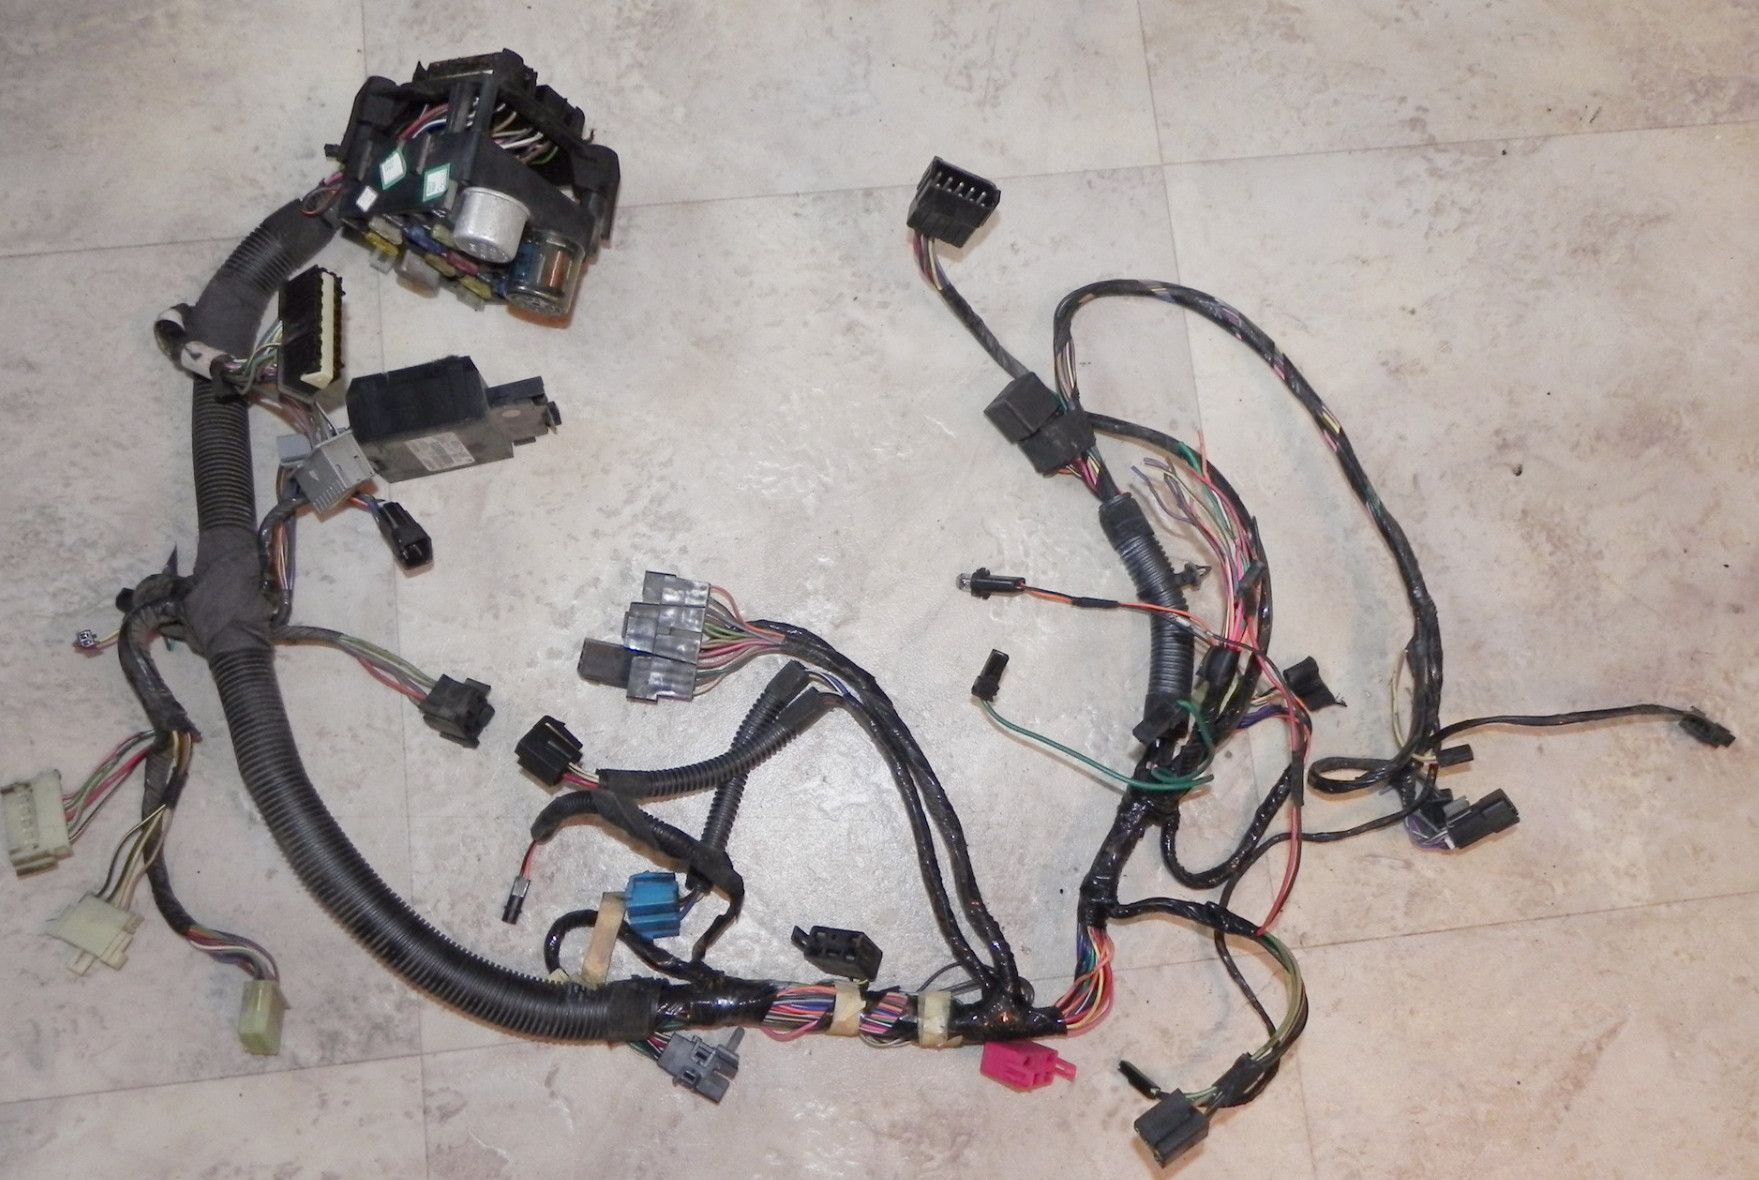 jeep wrangler yj interior under dash wiring harness 92 95 [ 1759 x 1180 Pixel ]